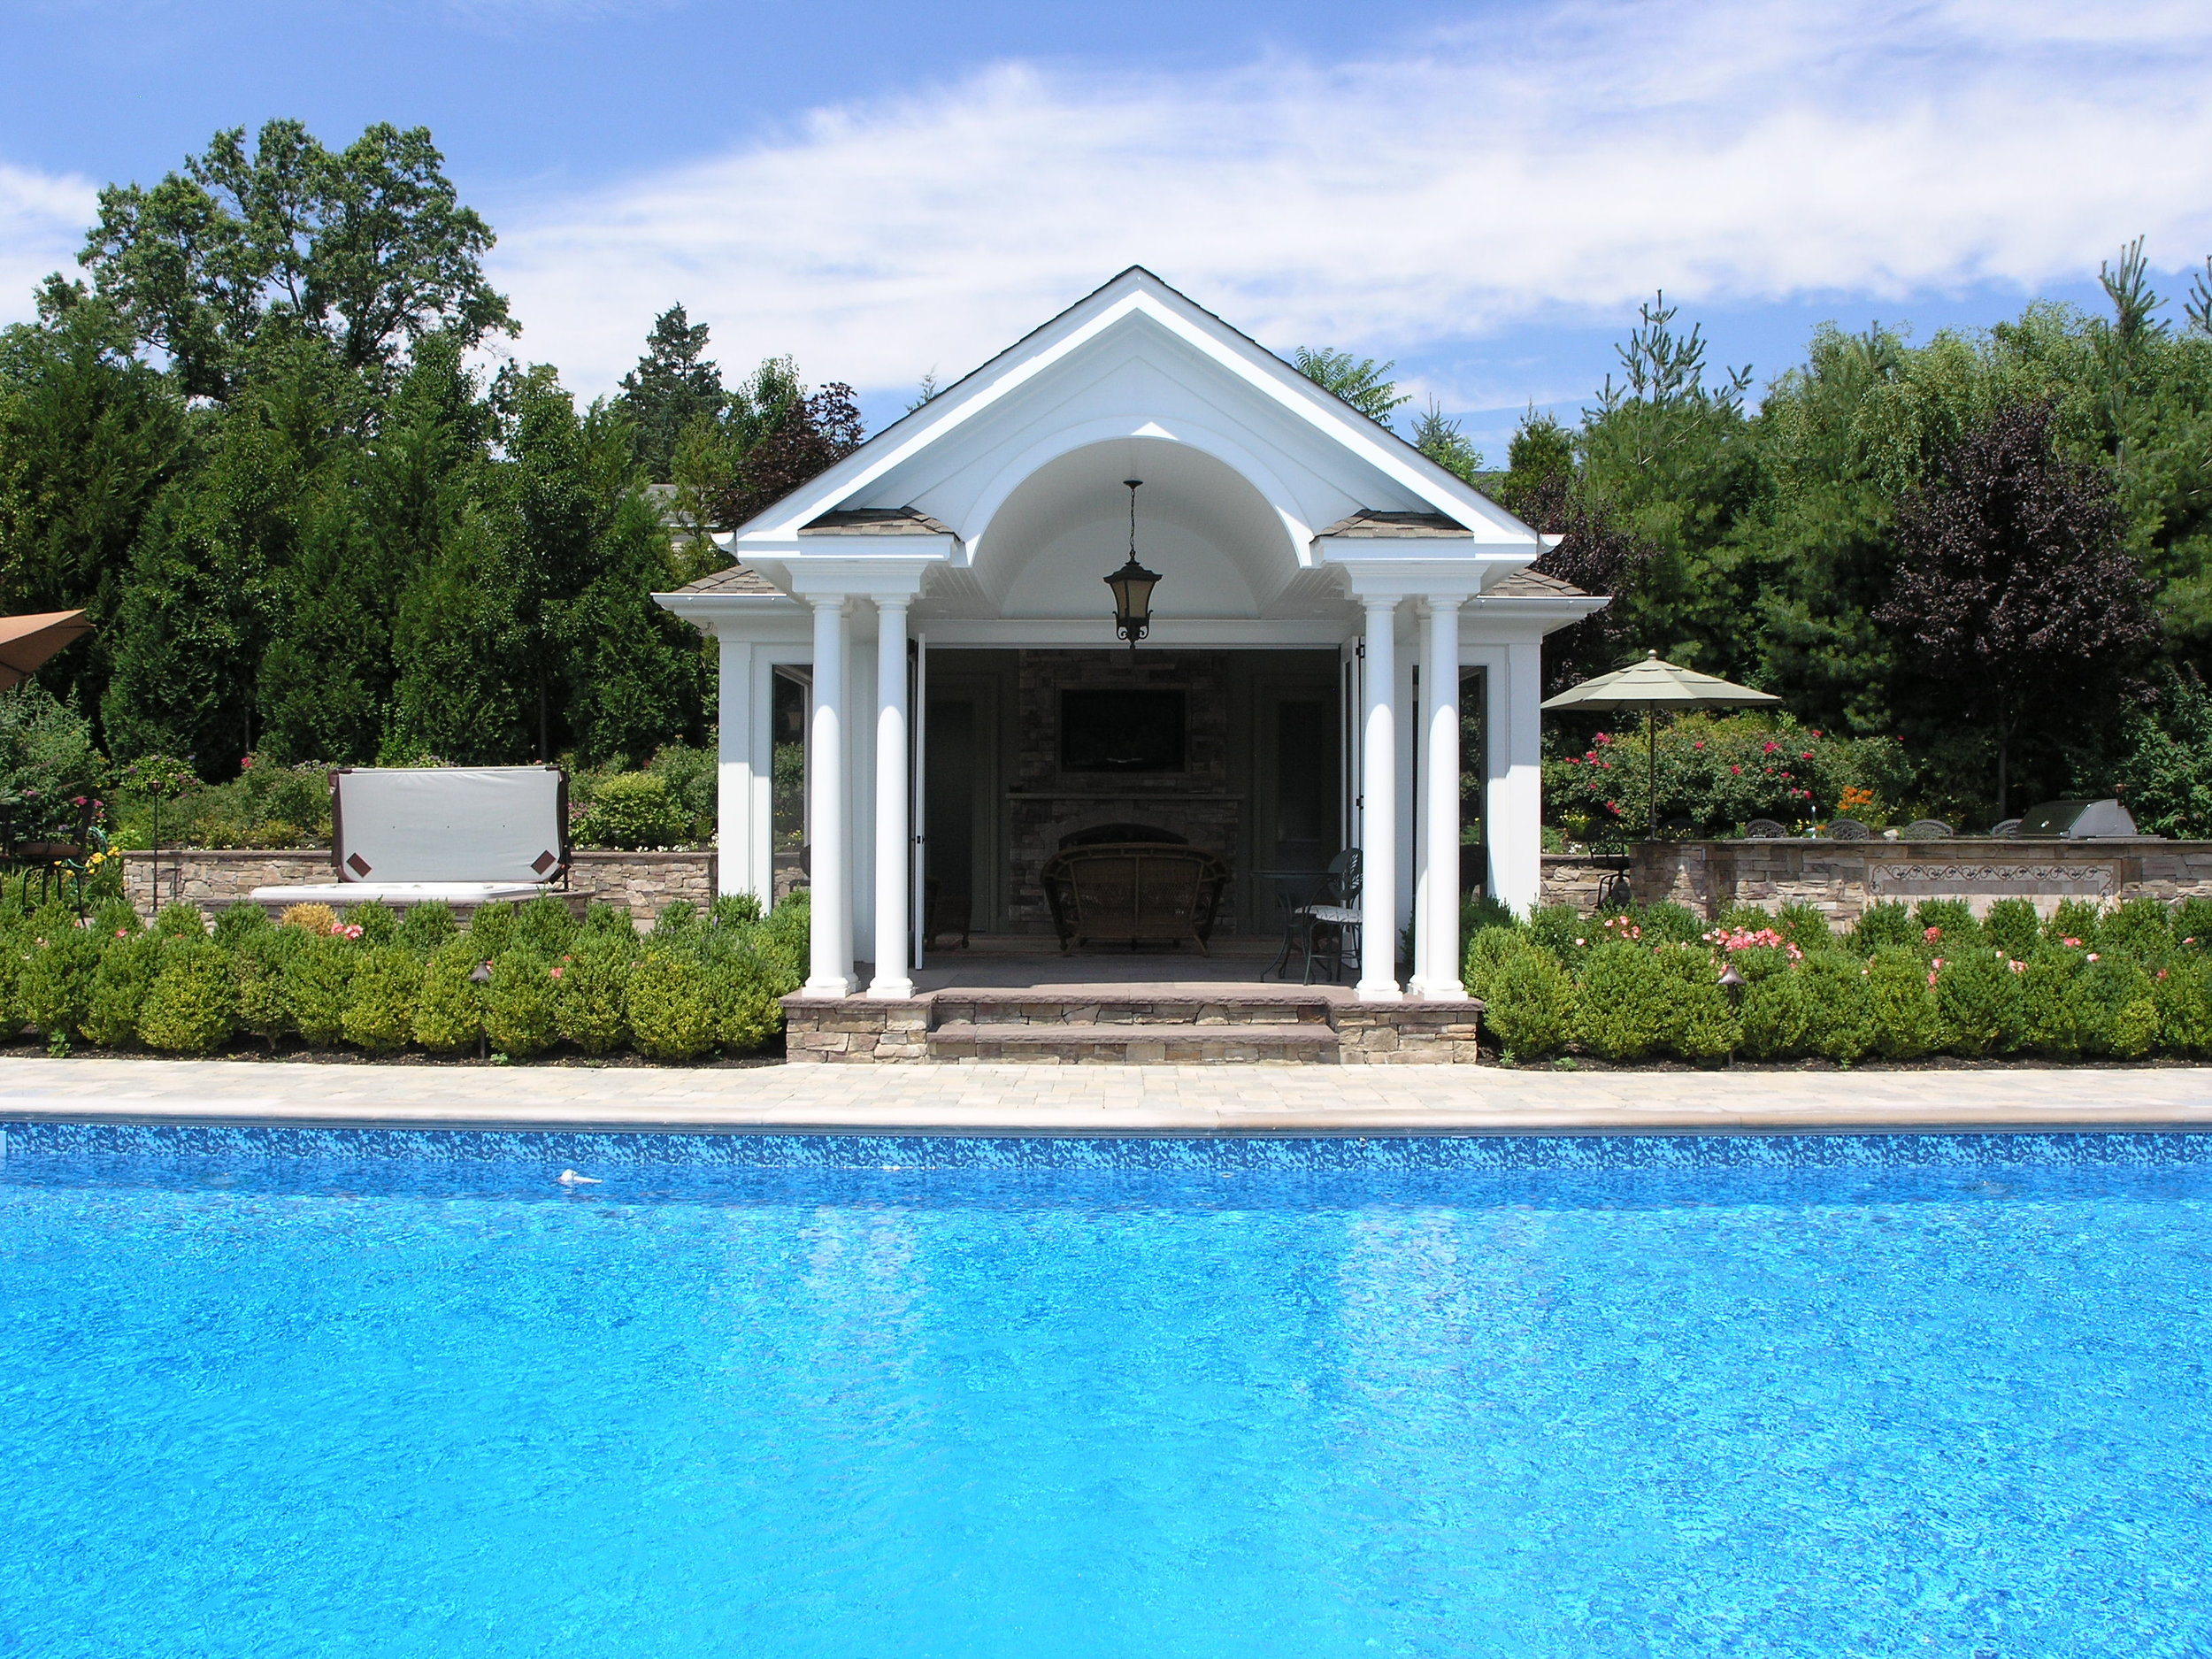 Professional landscape cabana design company in Long Island, NY